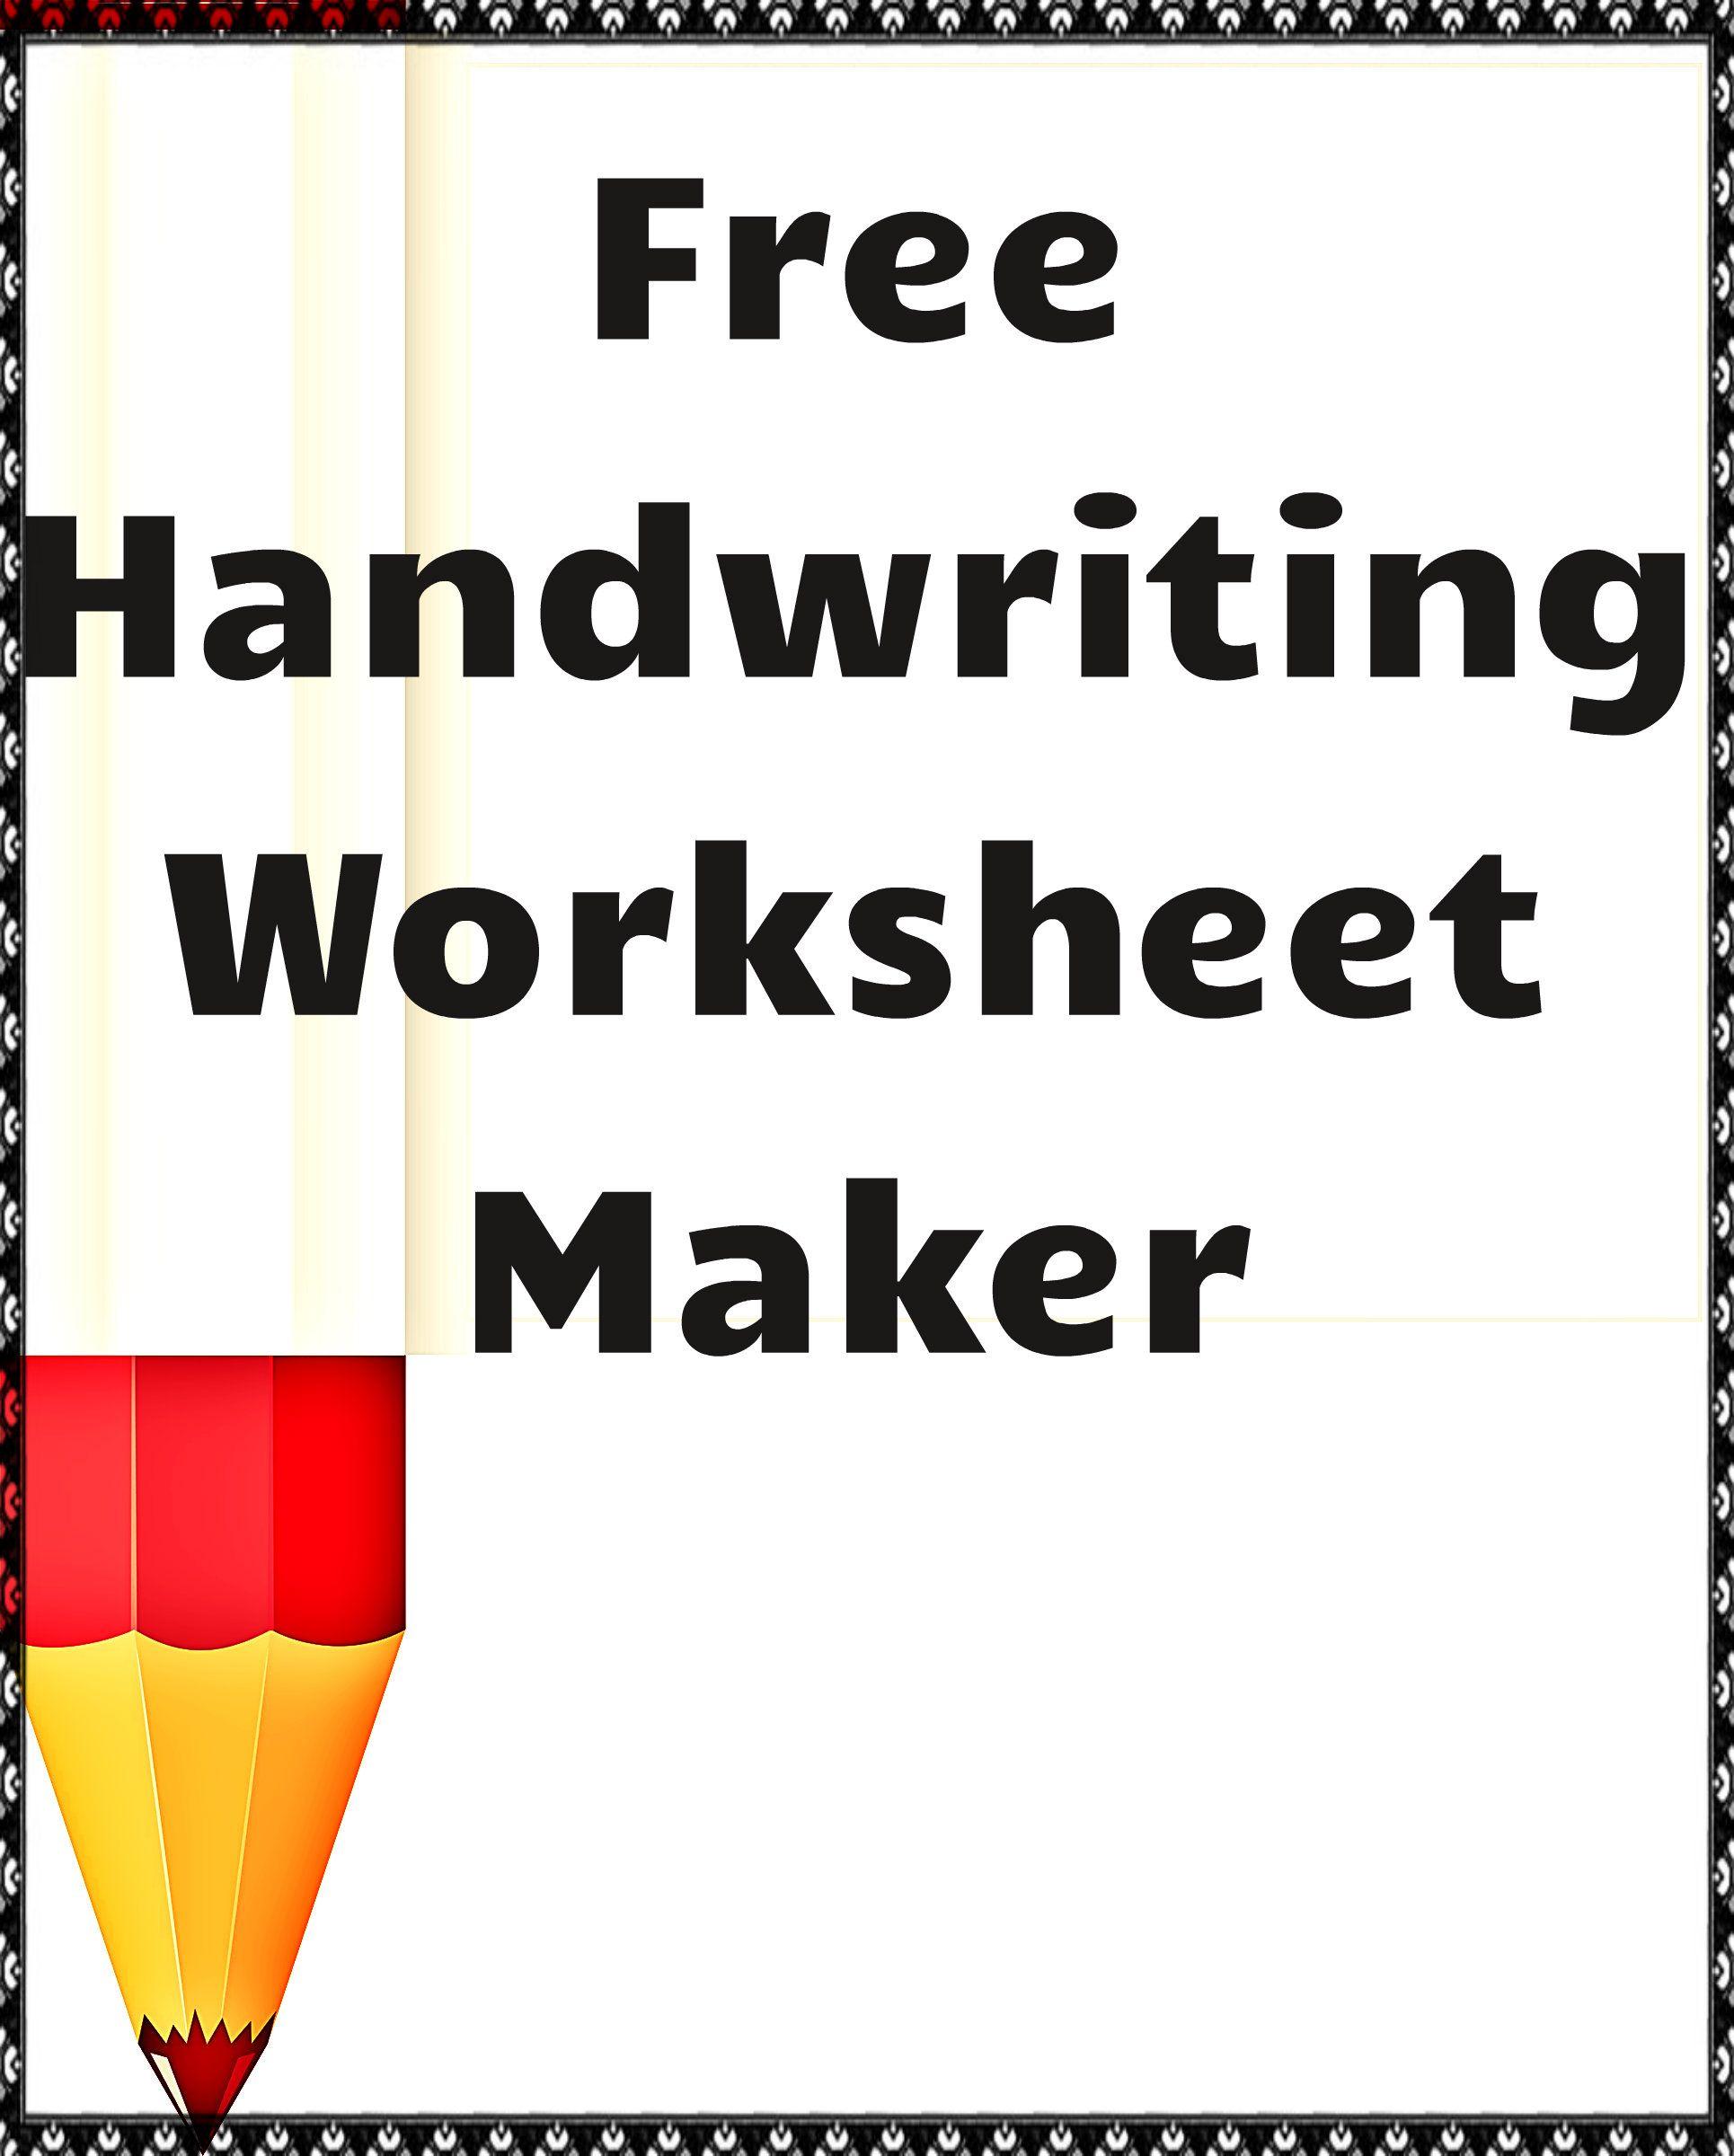 Handwriting Worksheet Maker | Handwriting Worksheet Maker